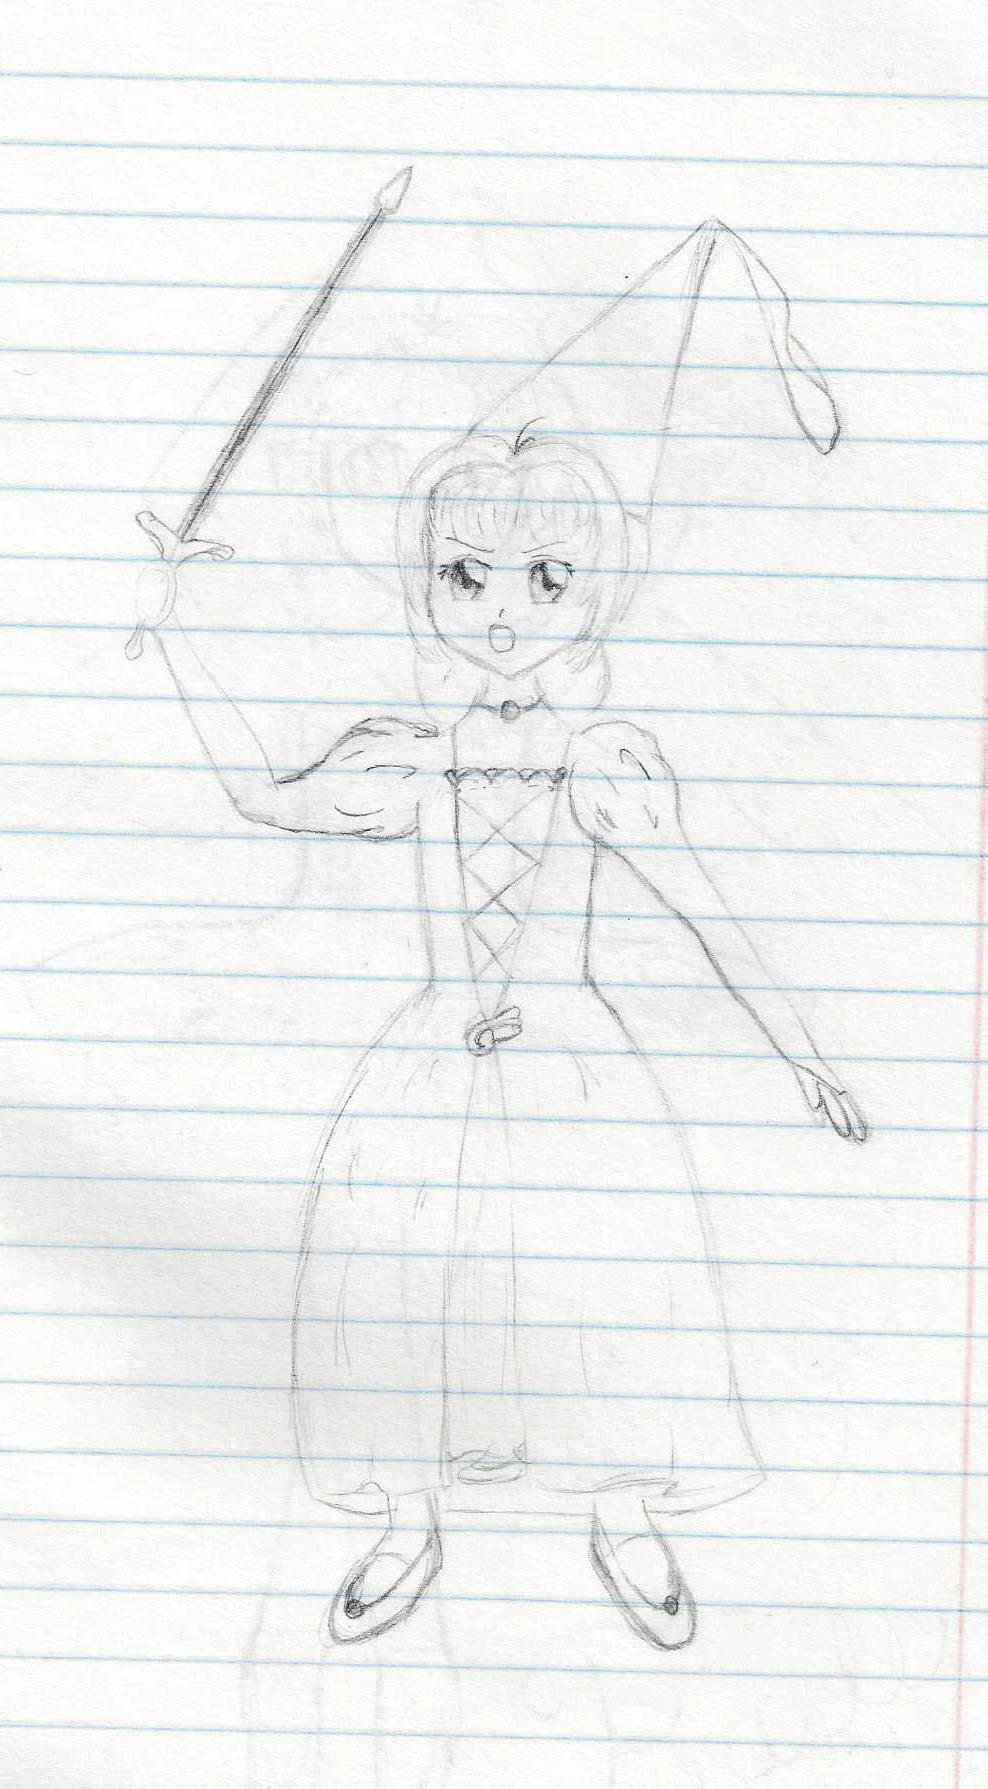 Fan Art Friday: Sakura-hime with Sword